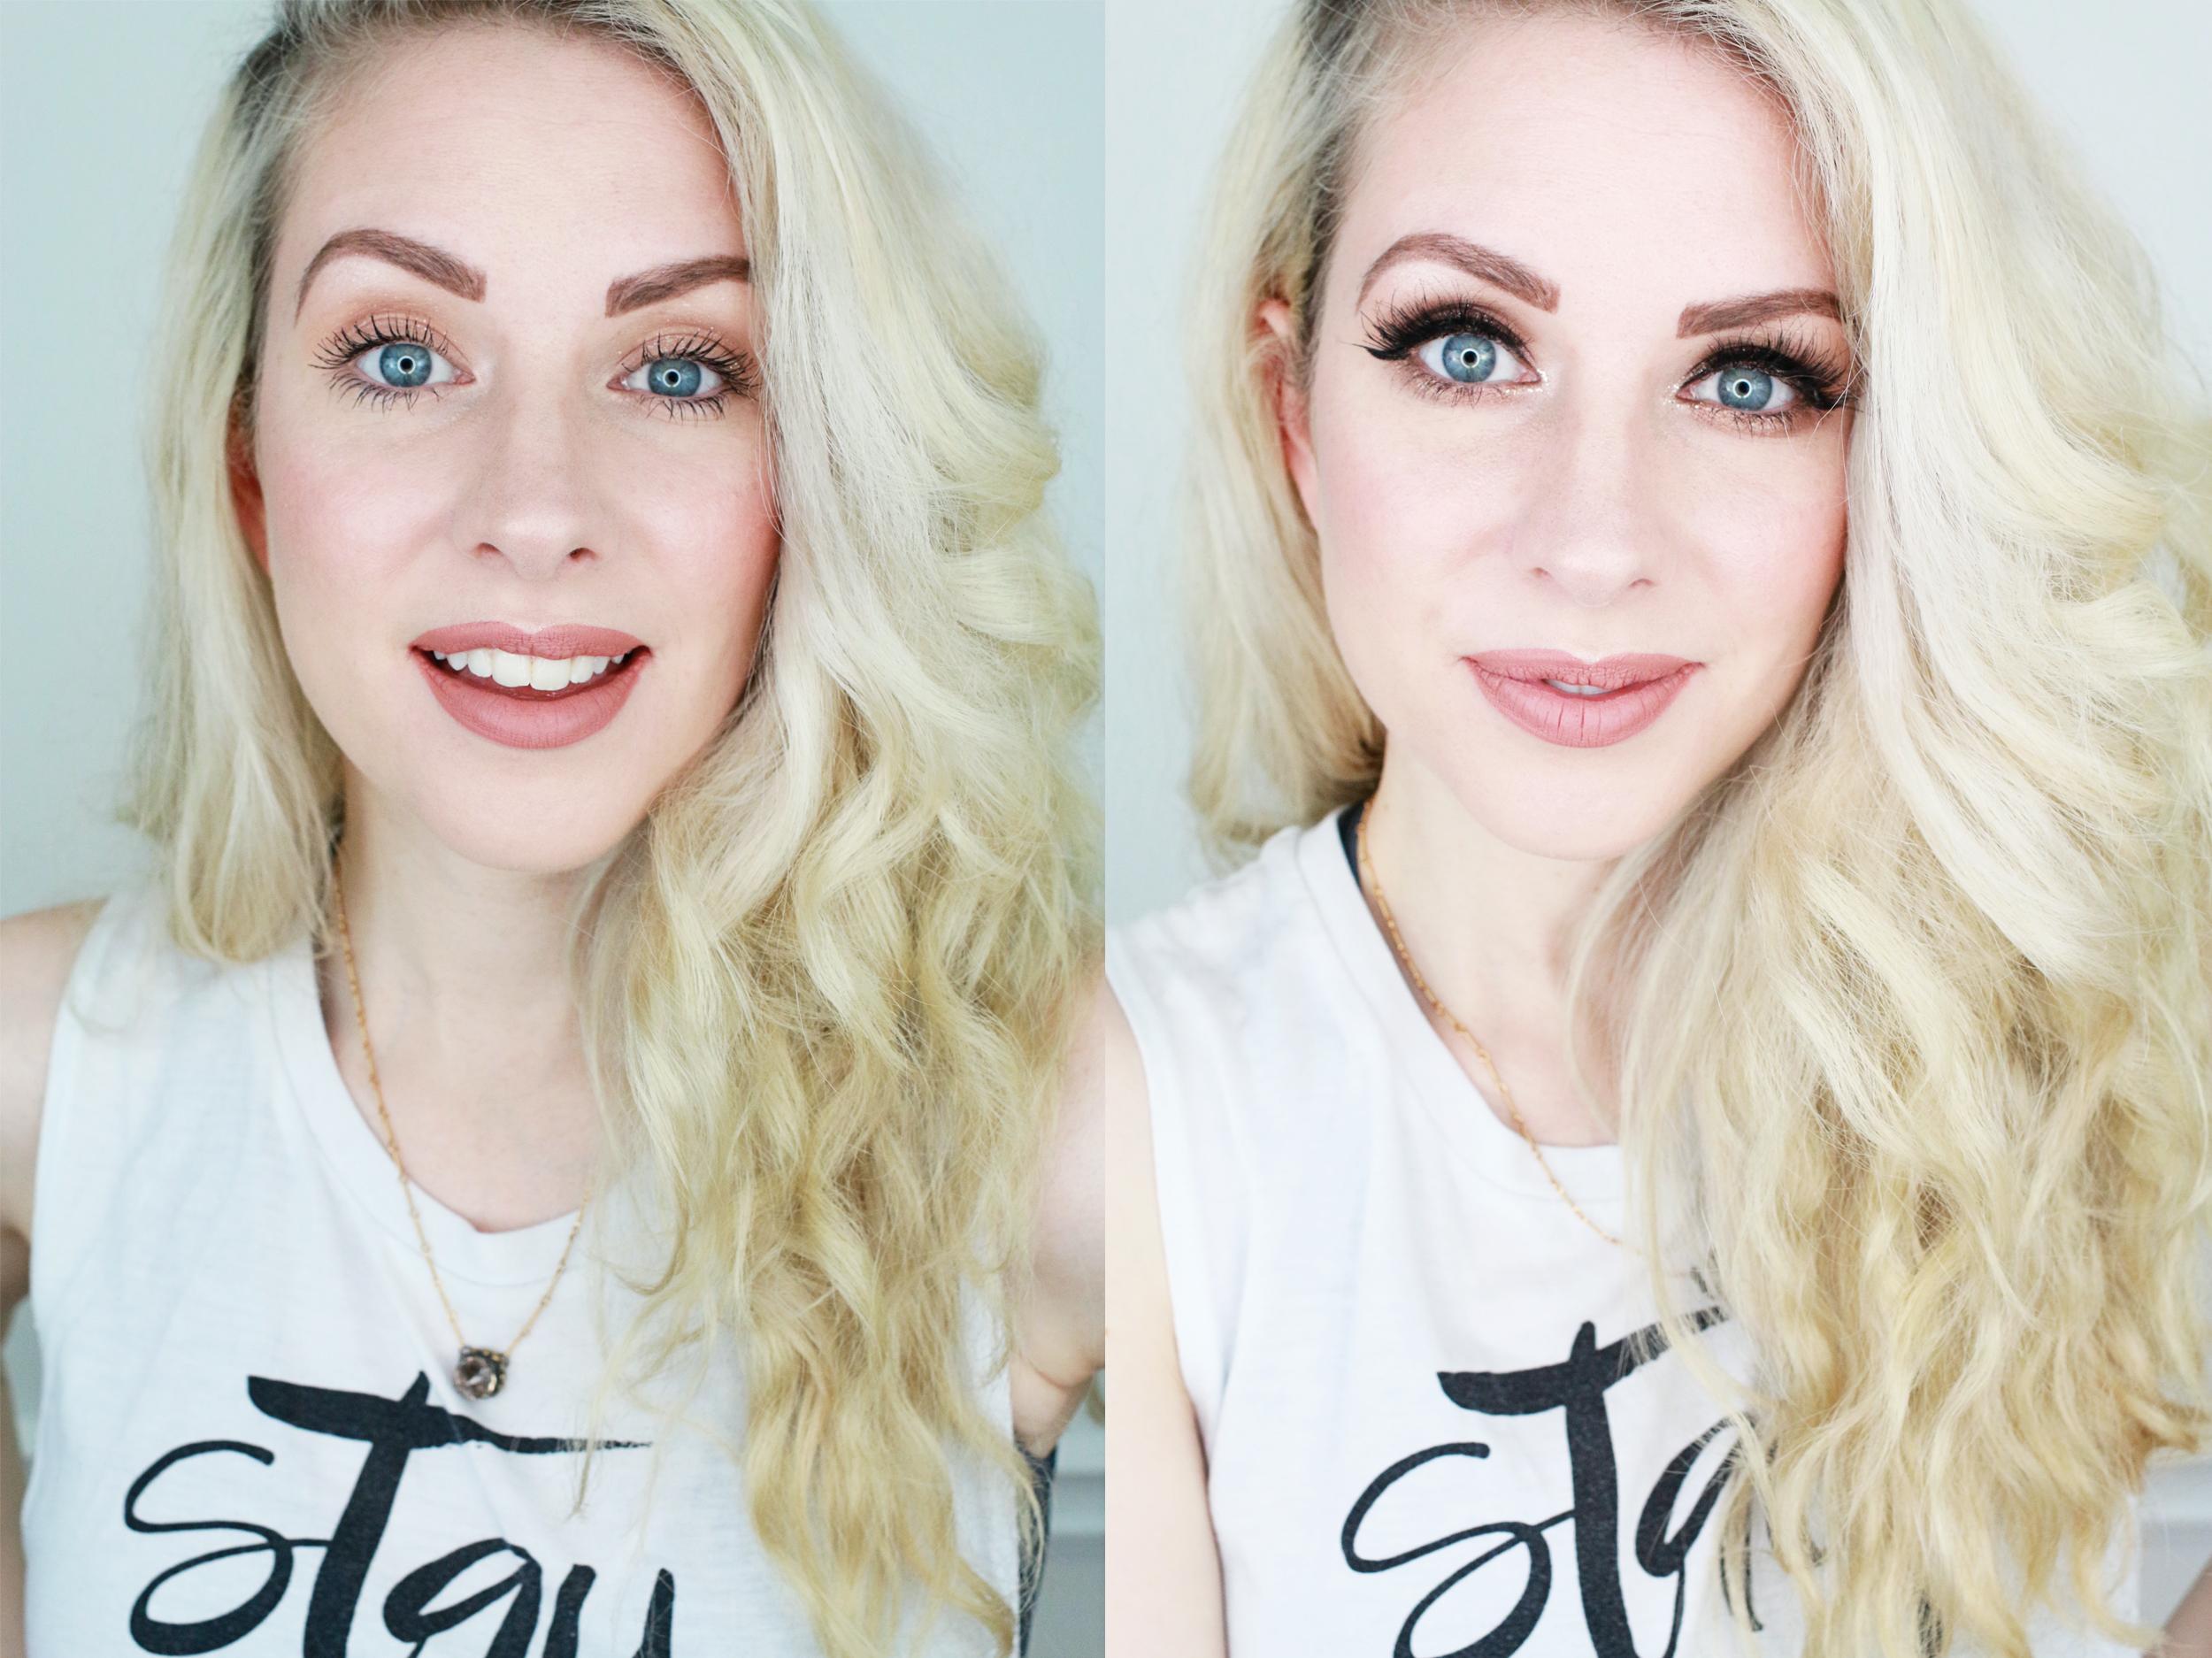 Day + Night Makeup